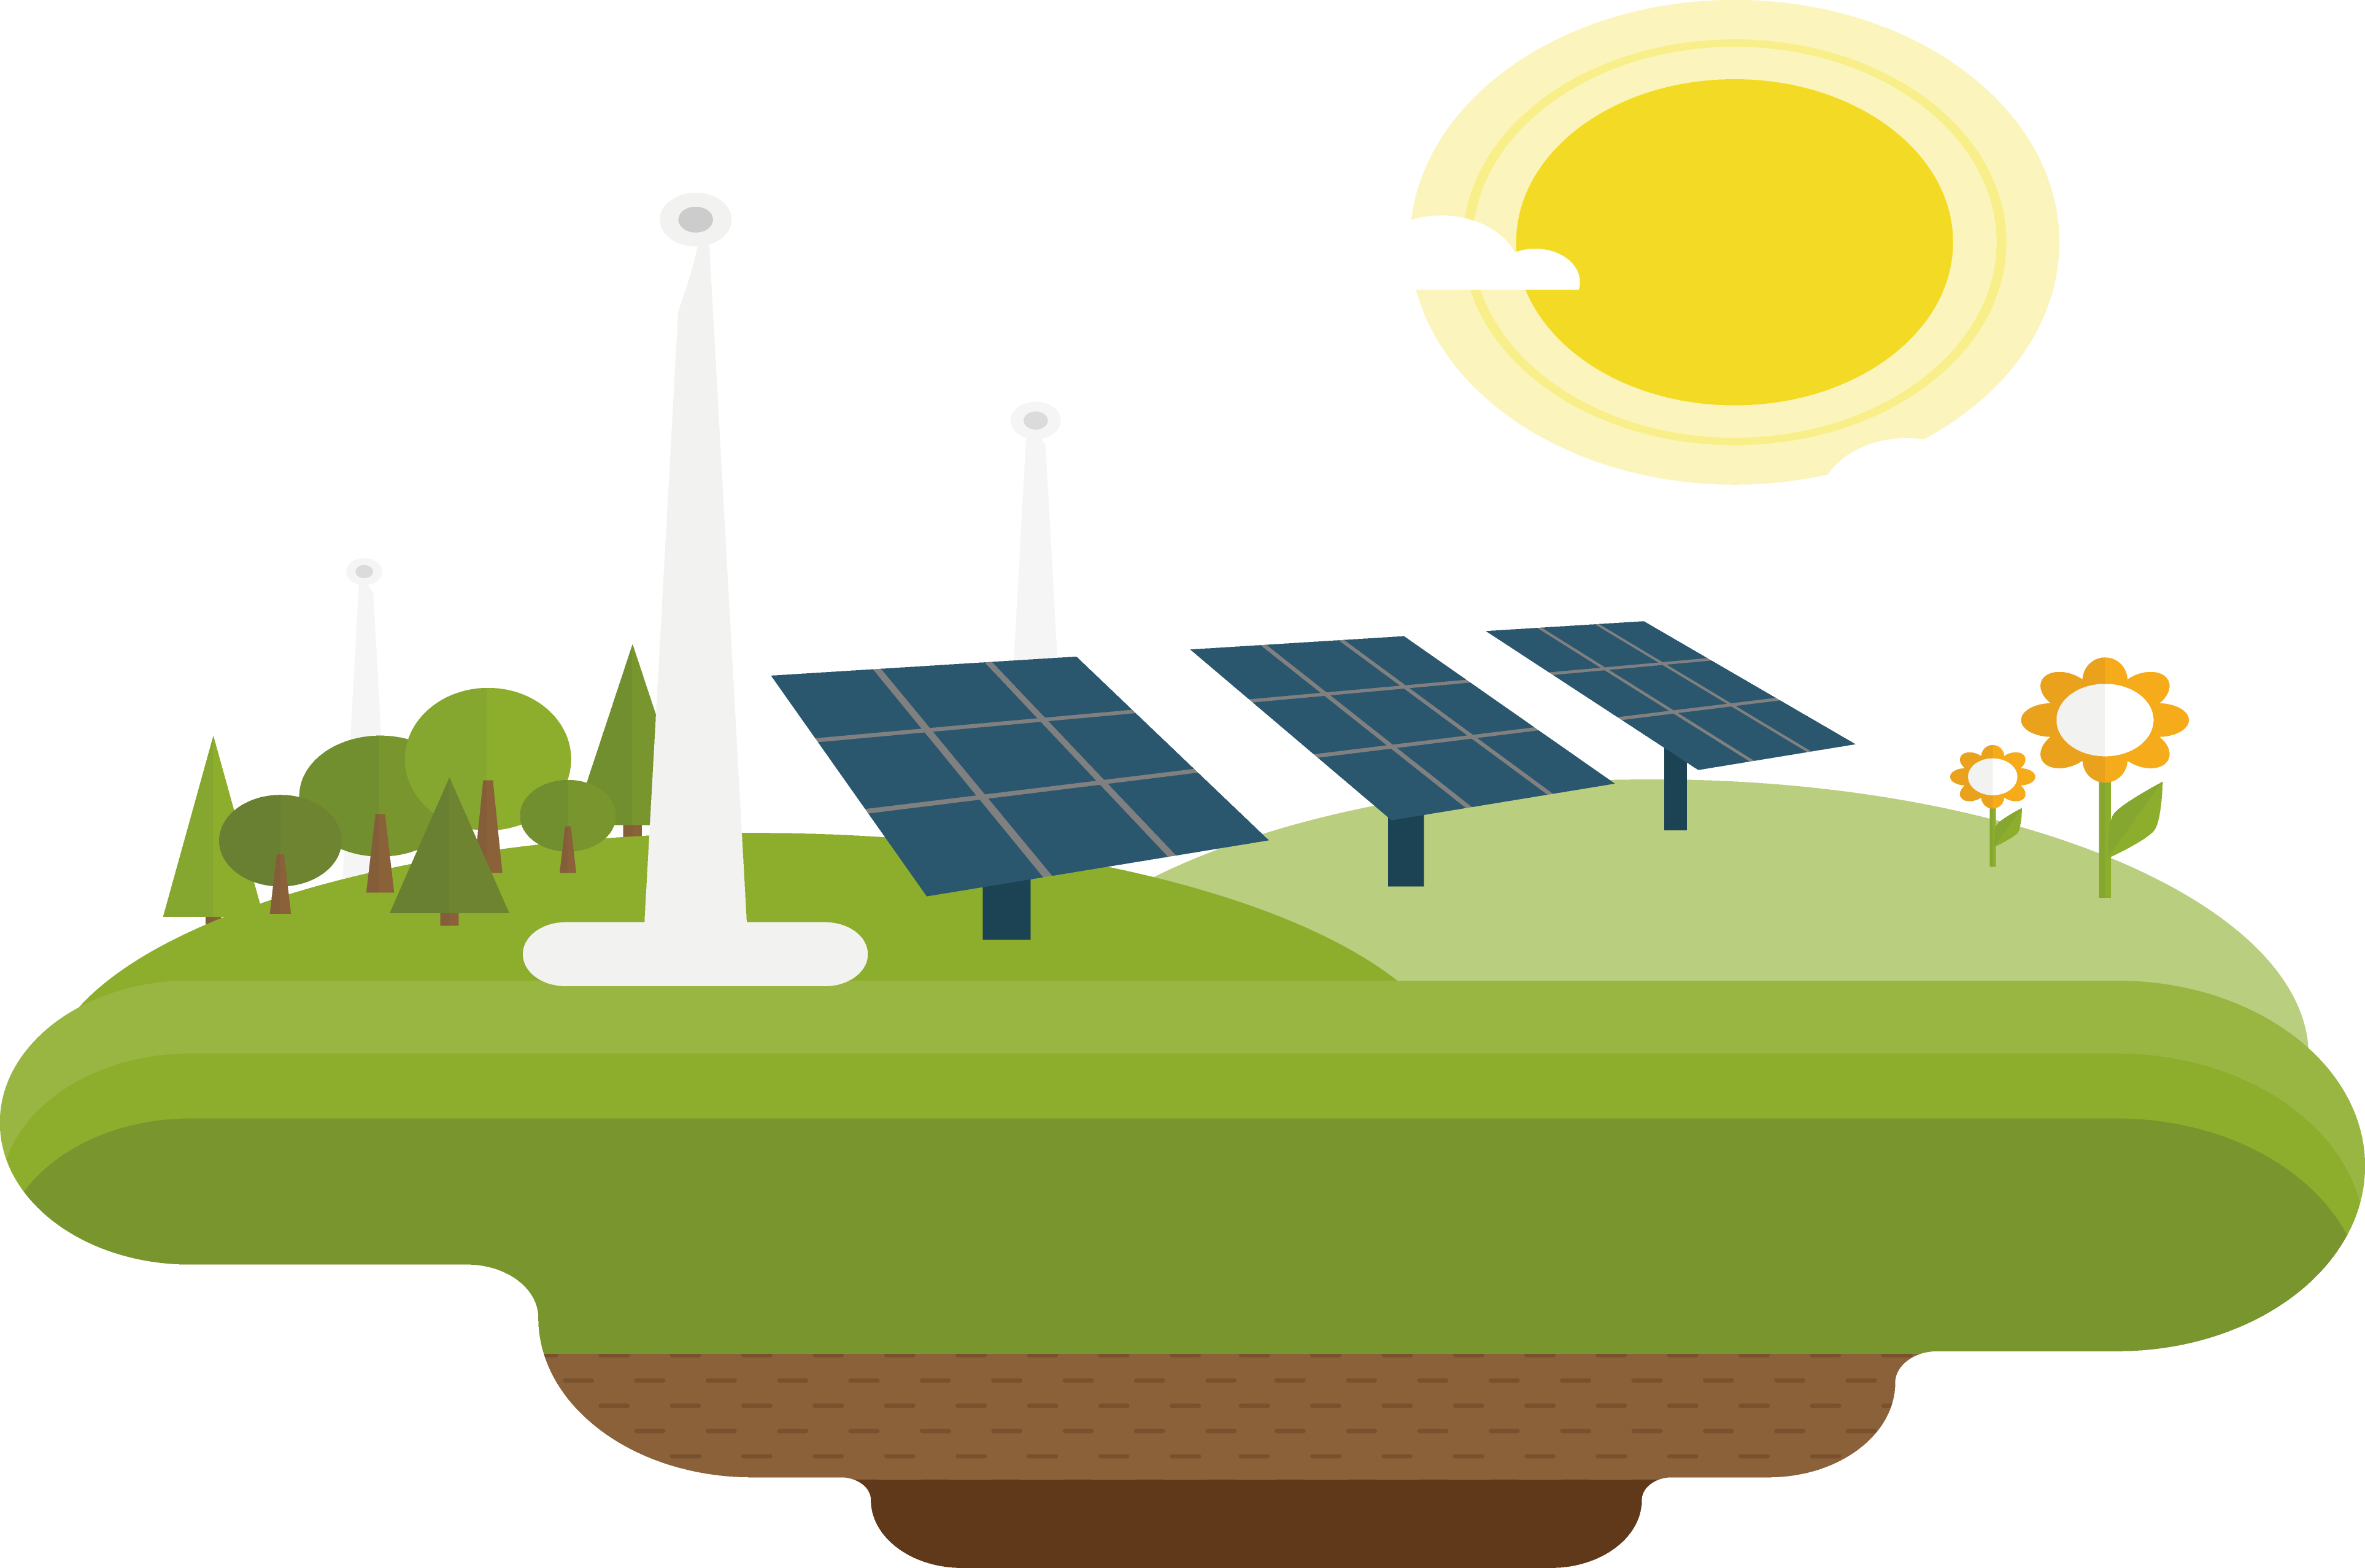 Energy clipart renewable energy. Solar wind power decorative